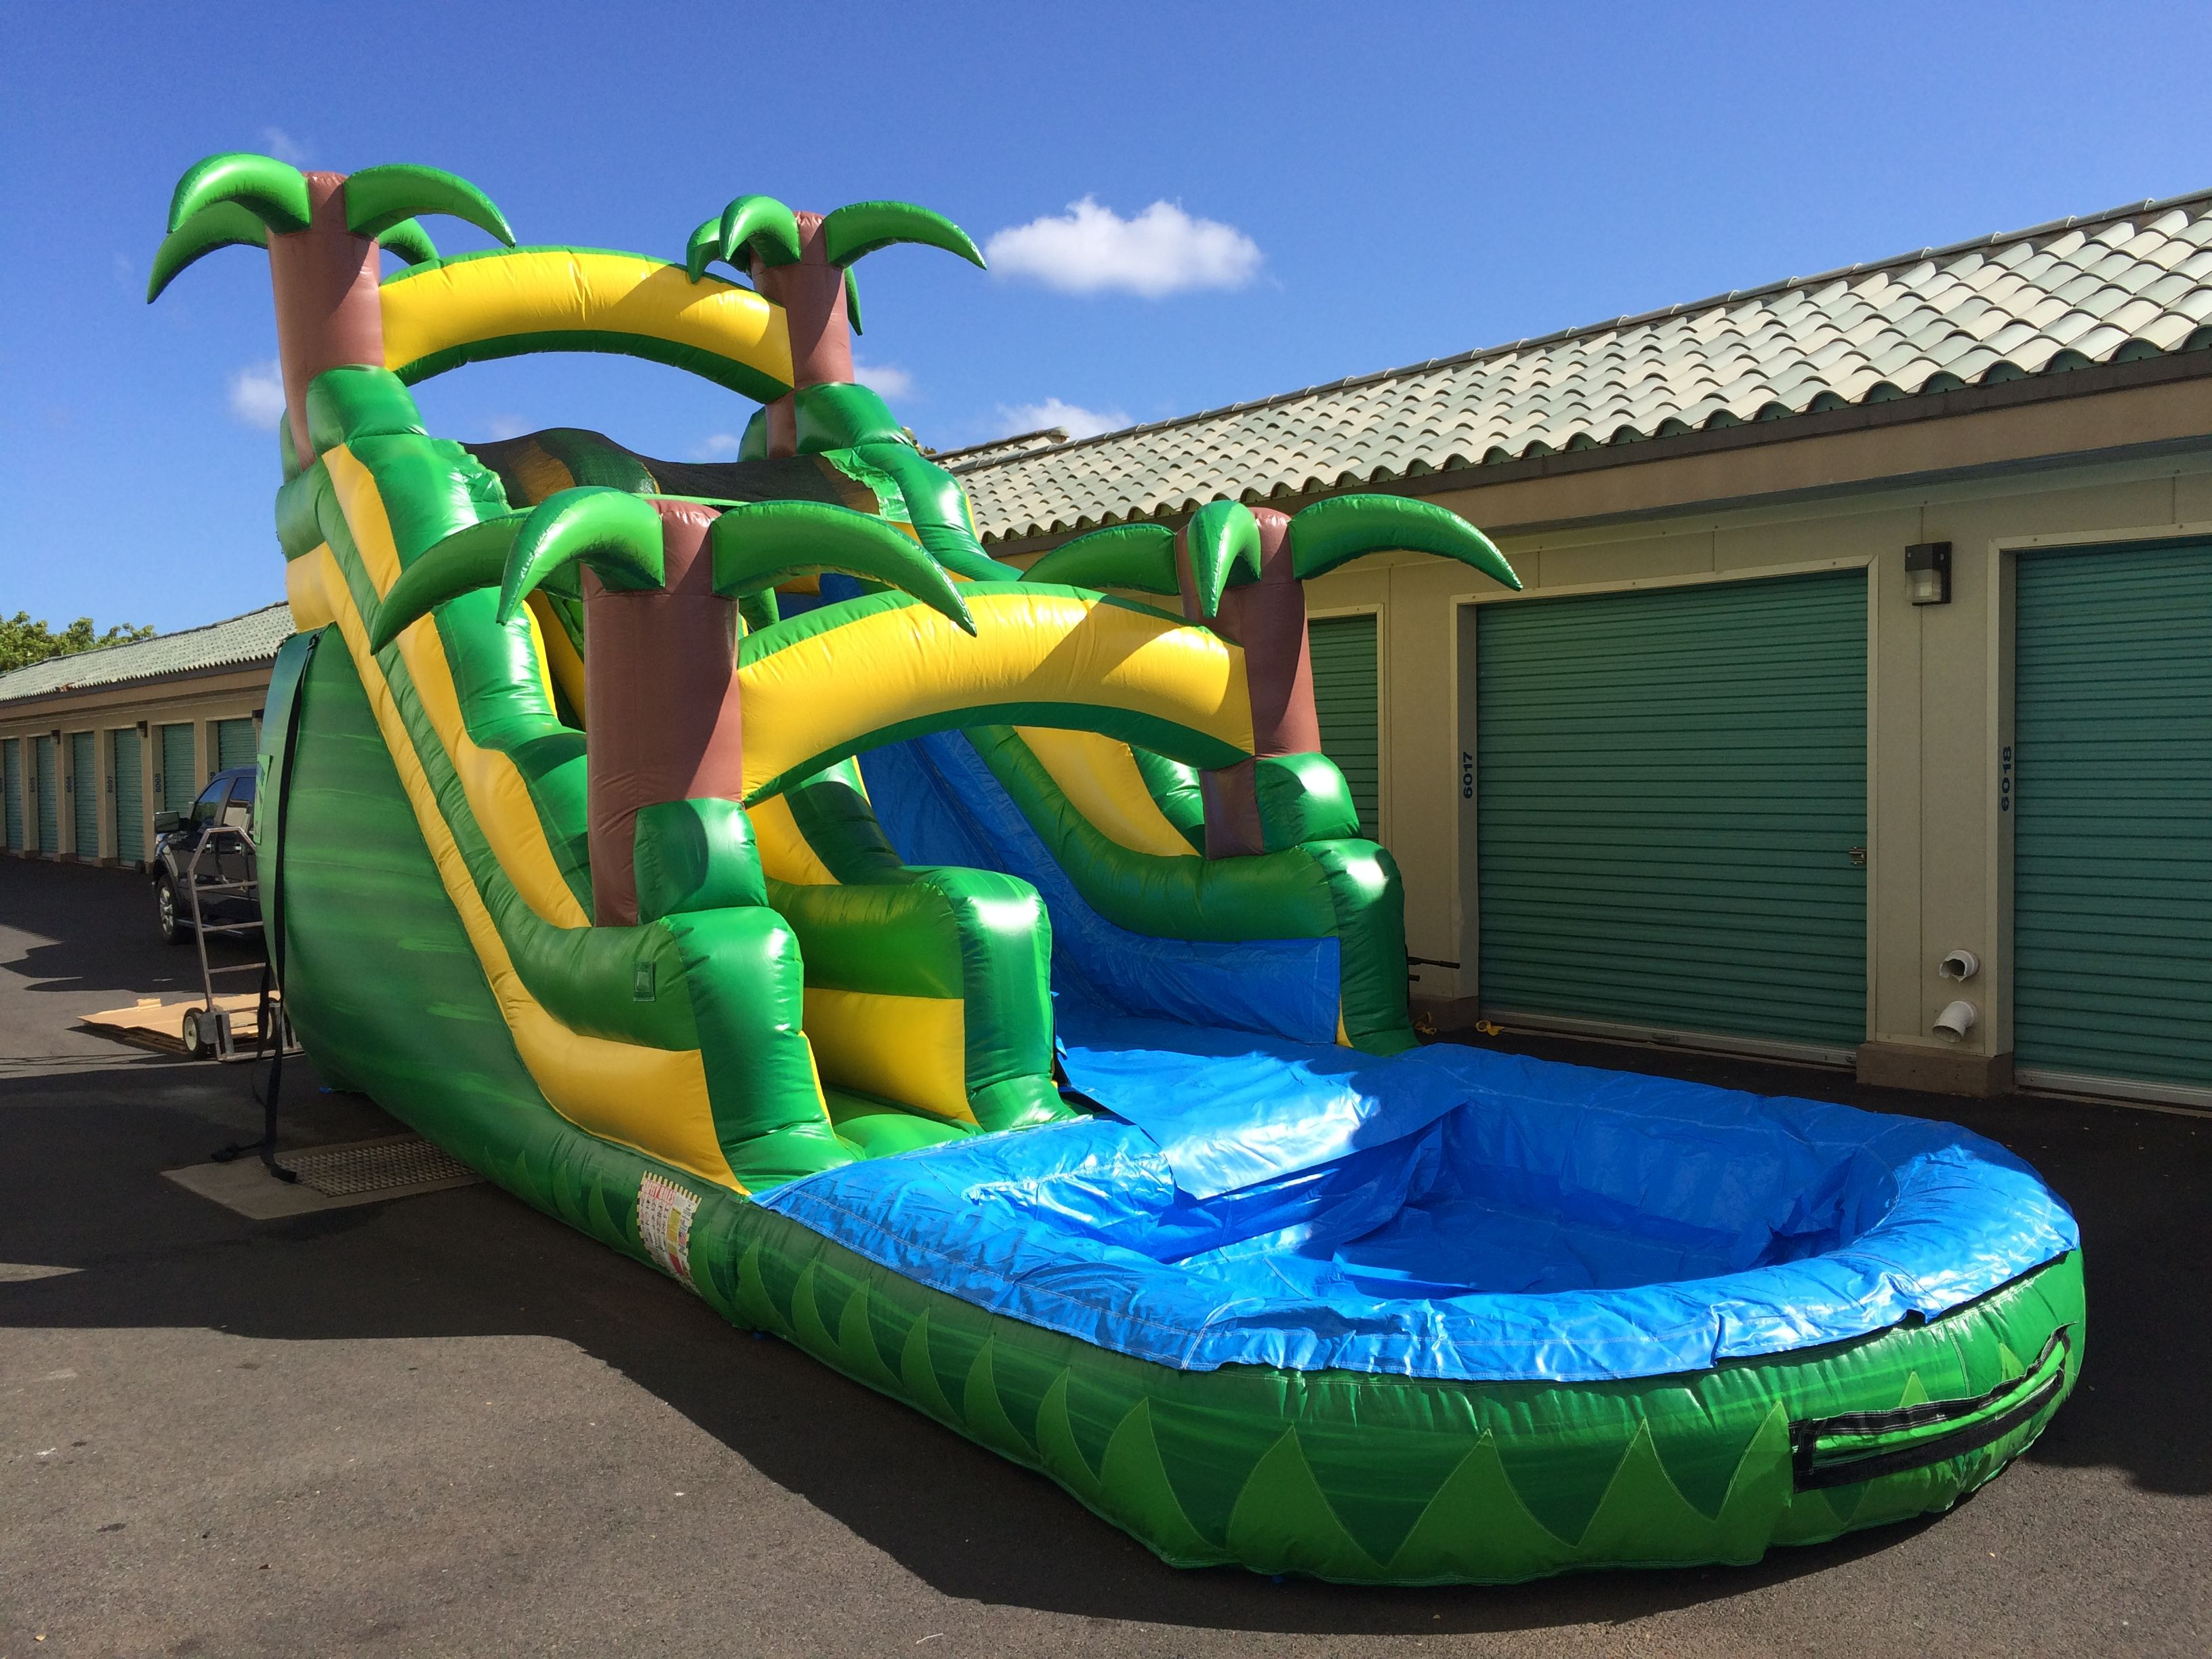 16ft Tropical Water Slide Hi Jump Inflatable Rentals Water Slides Inflatable Rentals Tropical